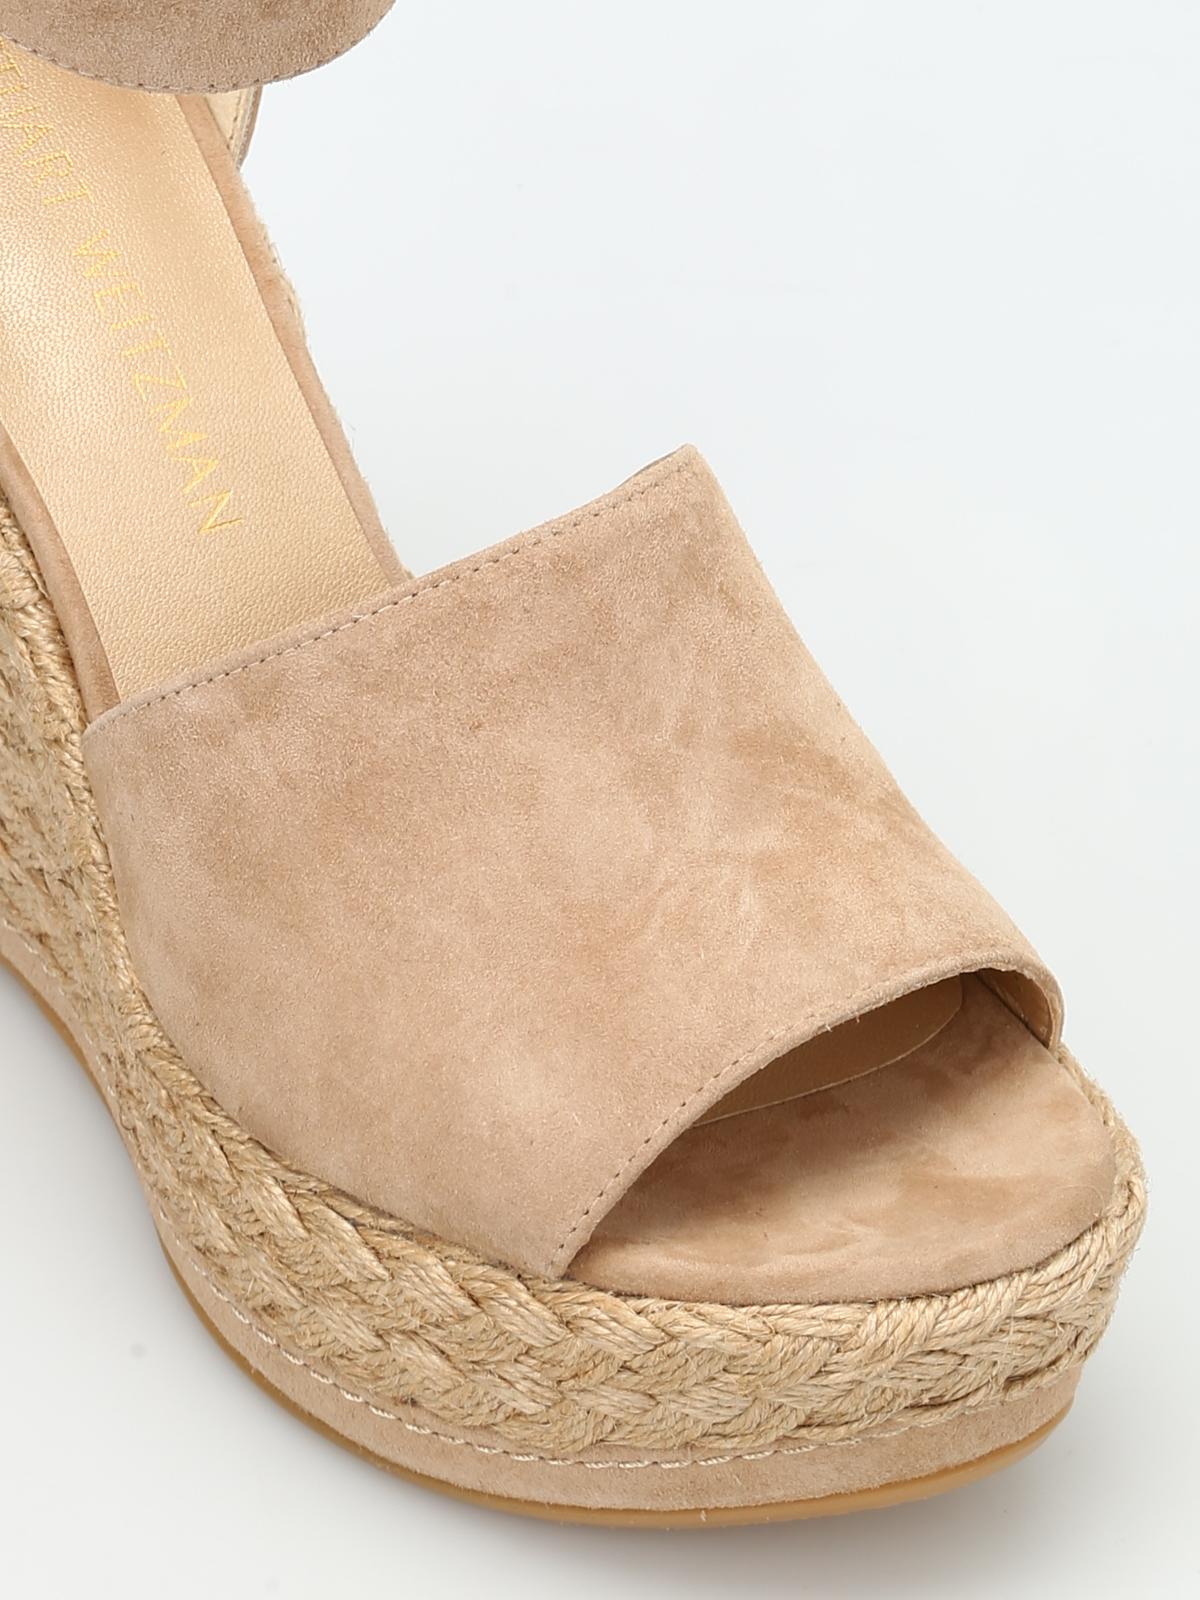 30225ce5a84 Stuart Weitzman - Sohojute wedge sandals - sandals - SOHOJUTE MOJAVE